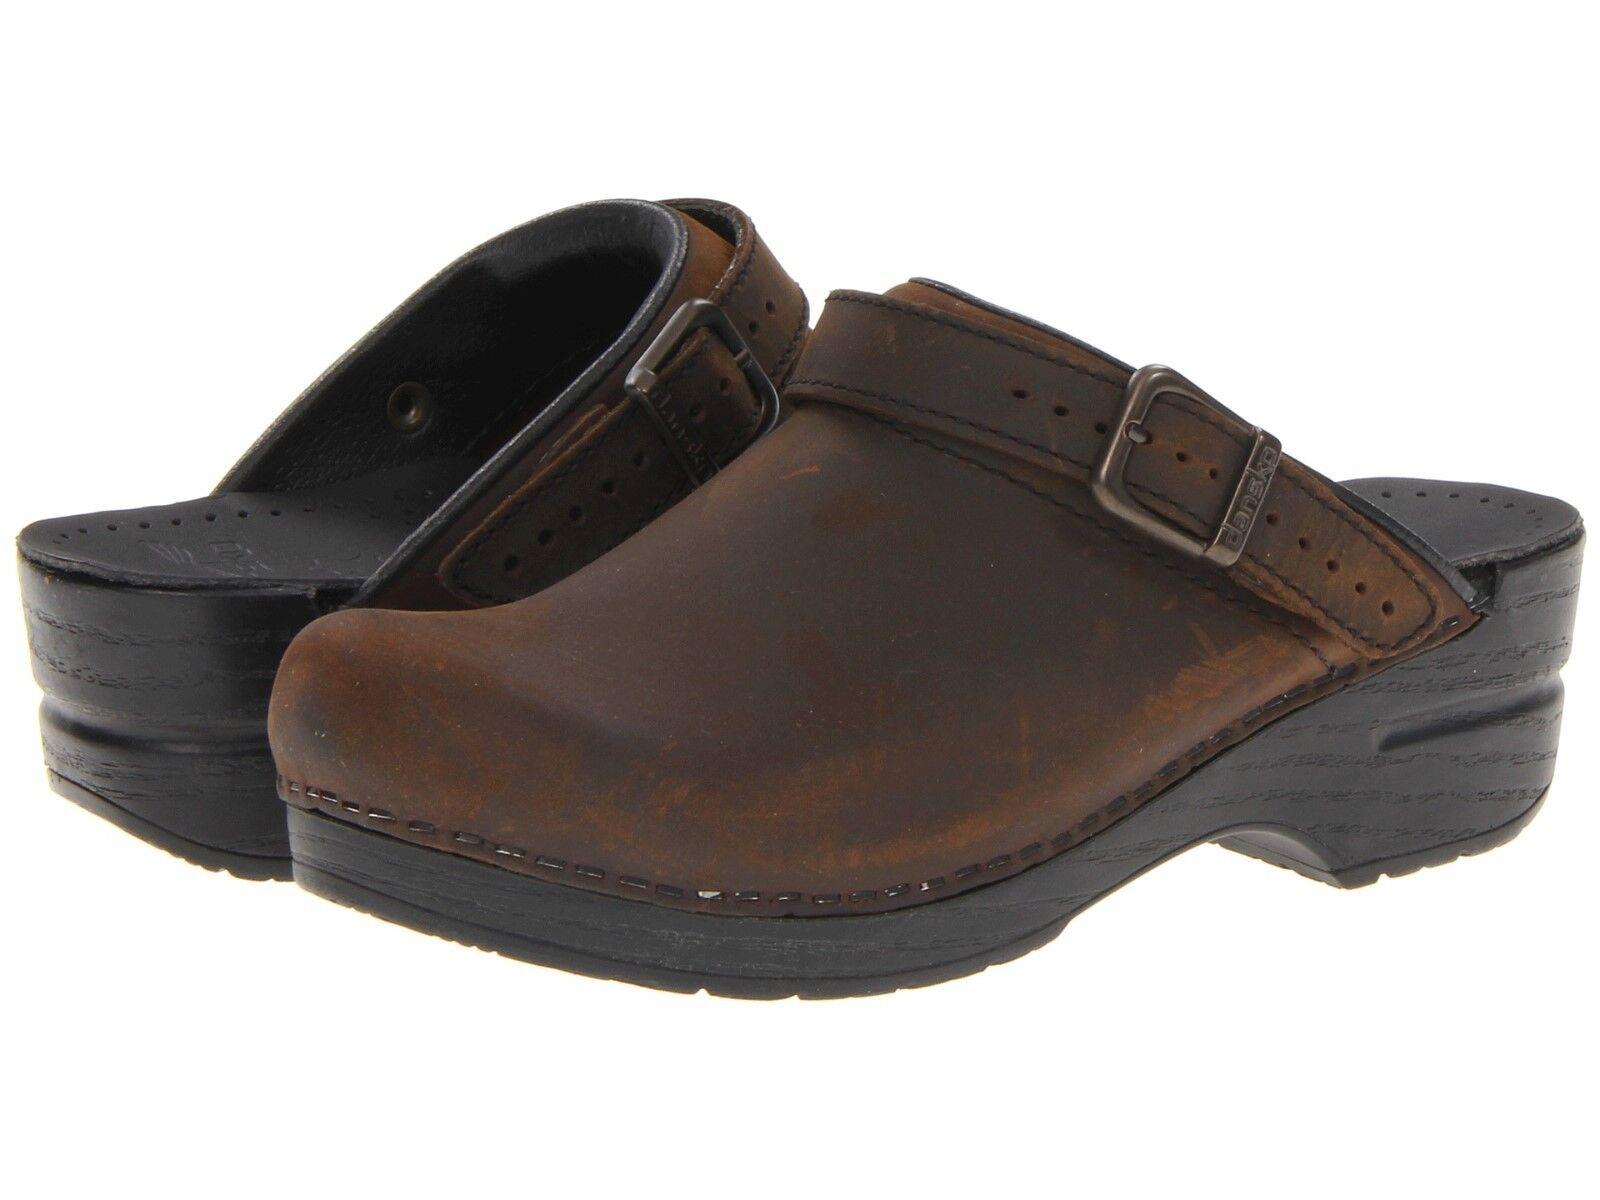 marca Donna  Dansko Ingrid Clogs Marrone Antique Marrone Oiled Oiled Oiled Leather  vanno a ruba